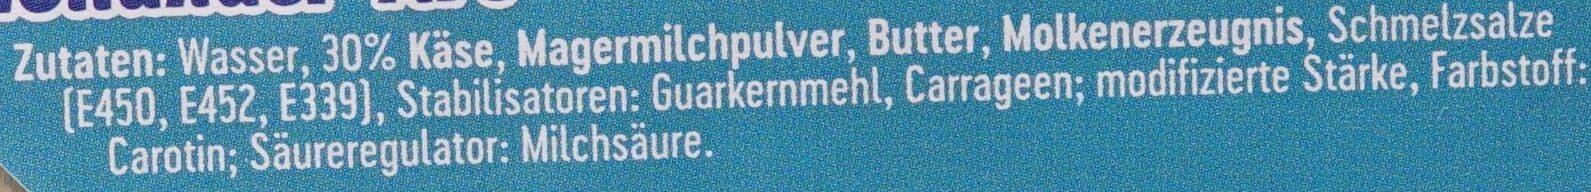 Holländer Art Schmelzkäse Zubereitung - 成分 - de